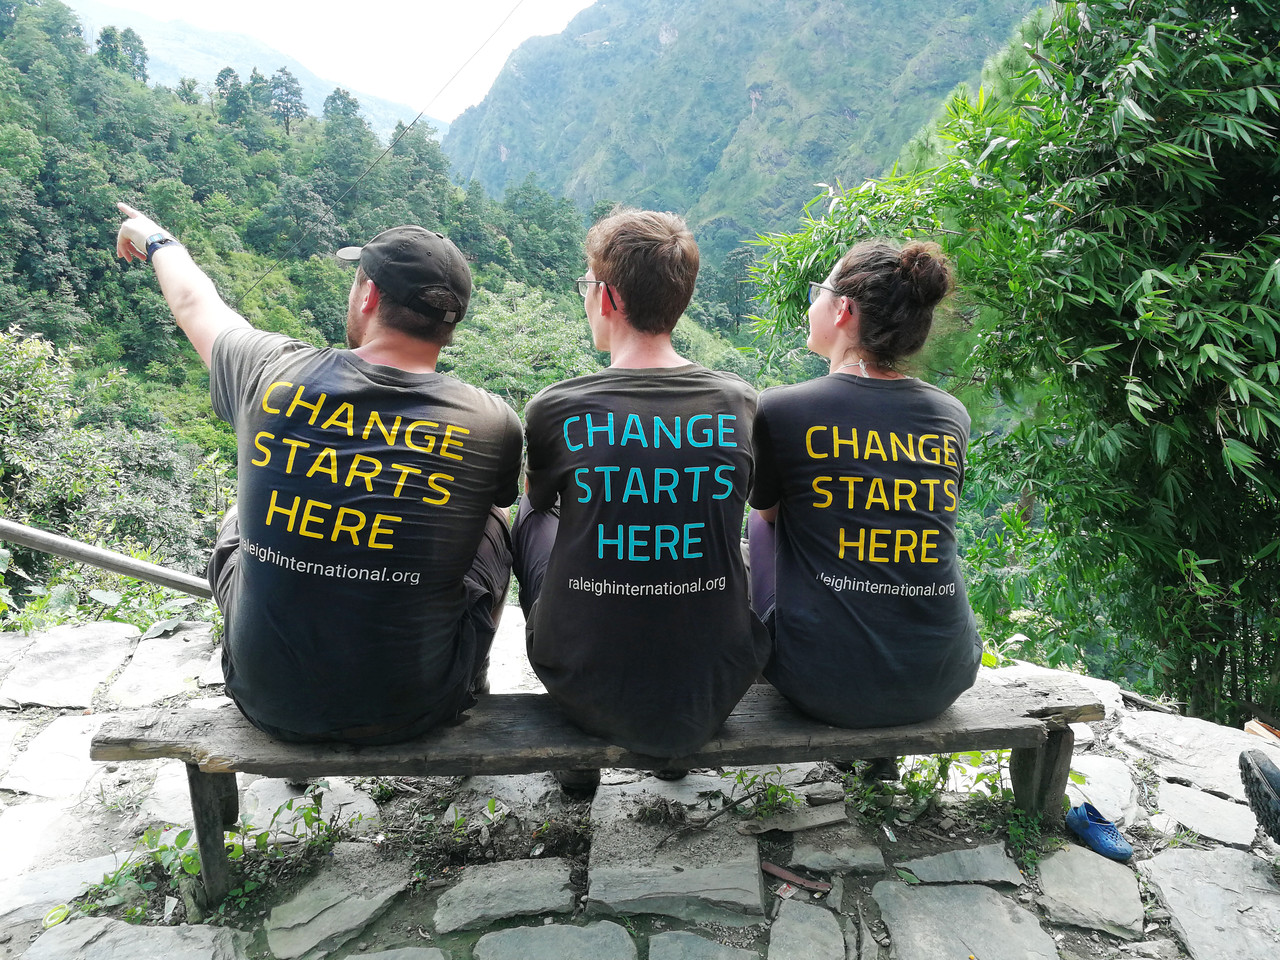 Gap Year Program - Volunteer in Nepal with Raleigh International - Change Starts Here  6